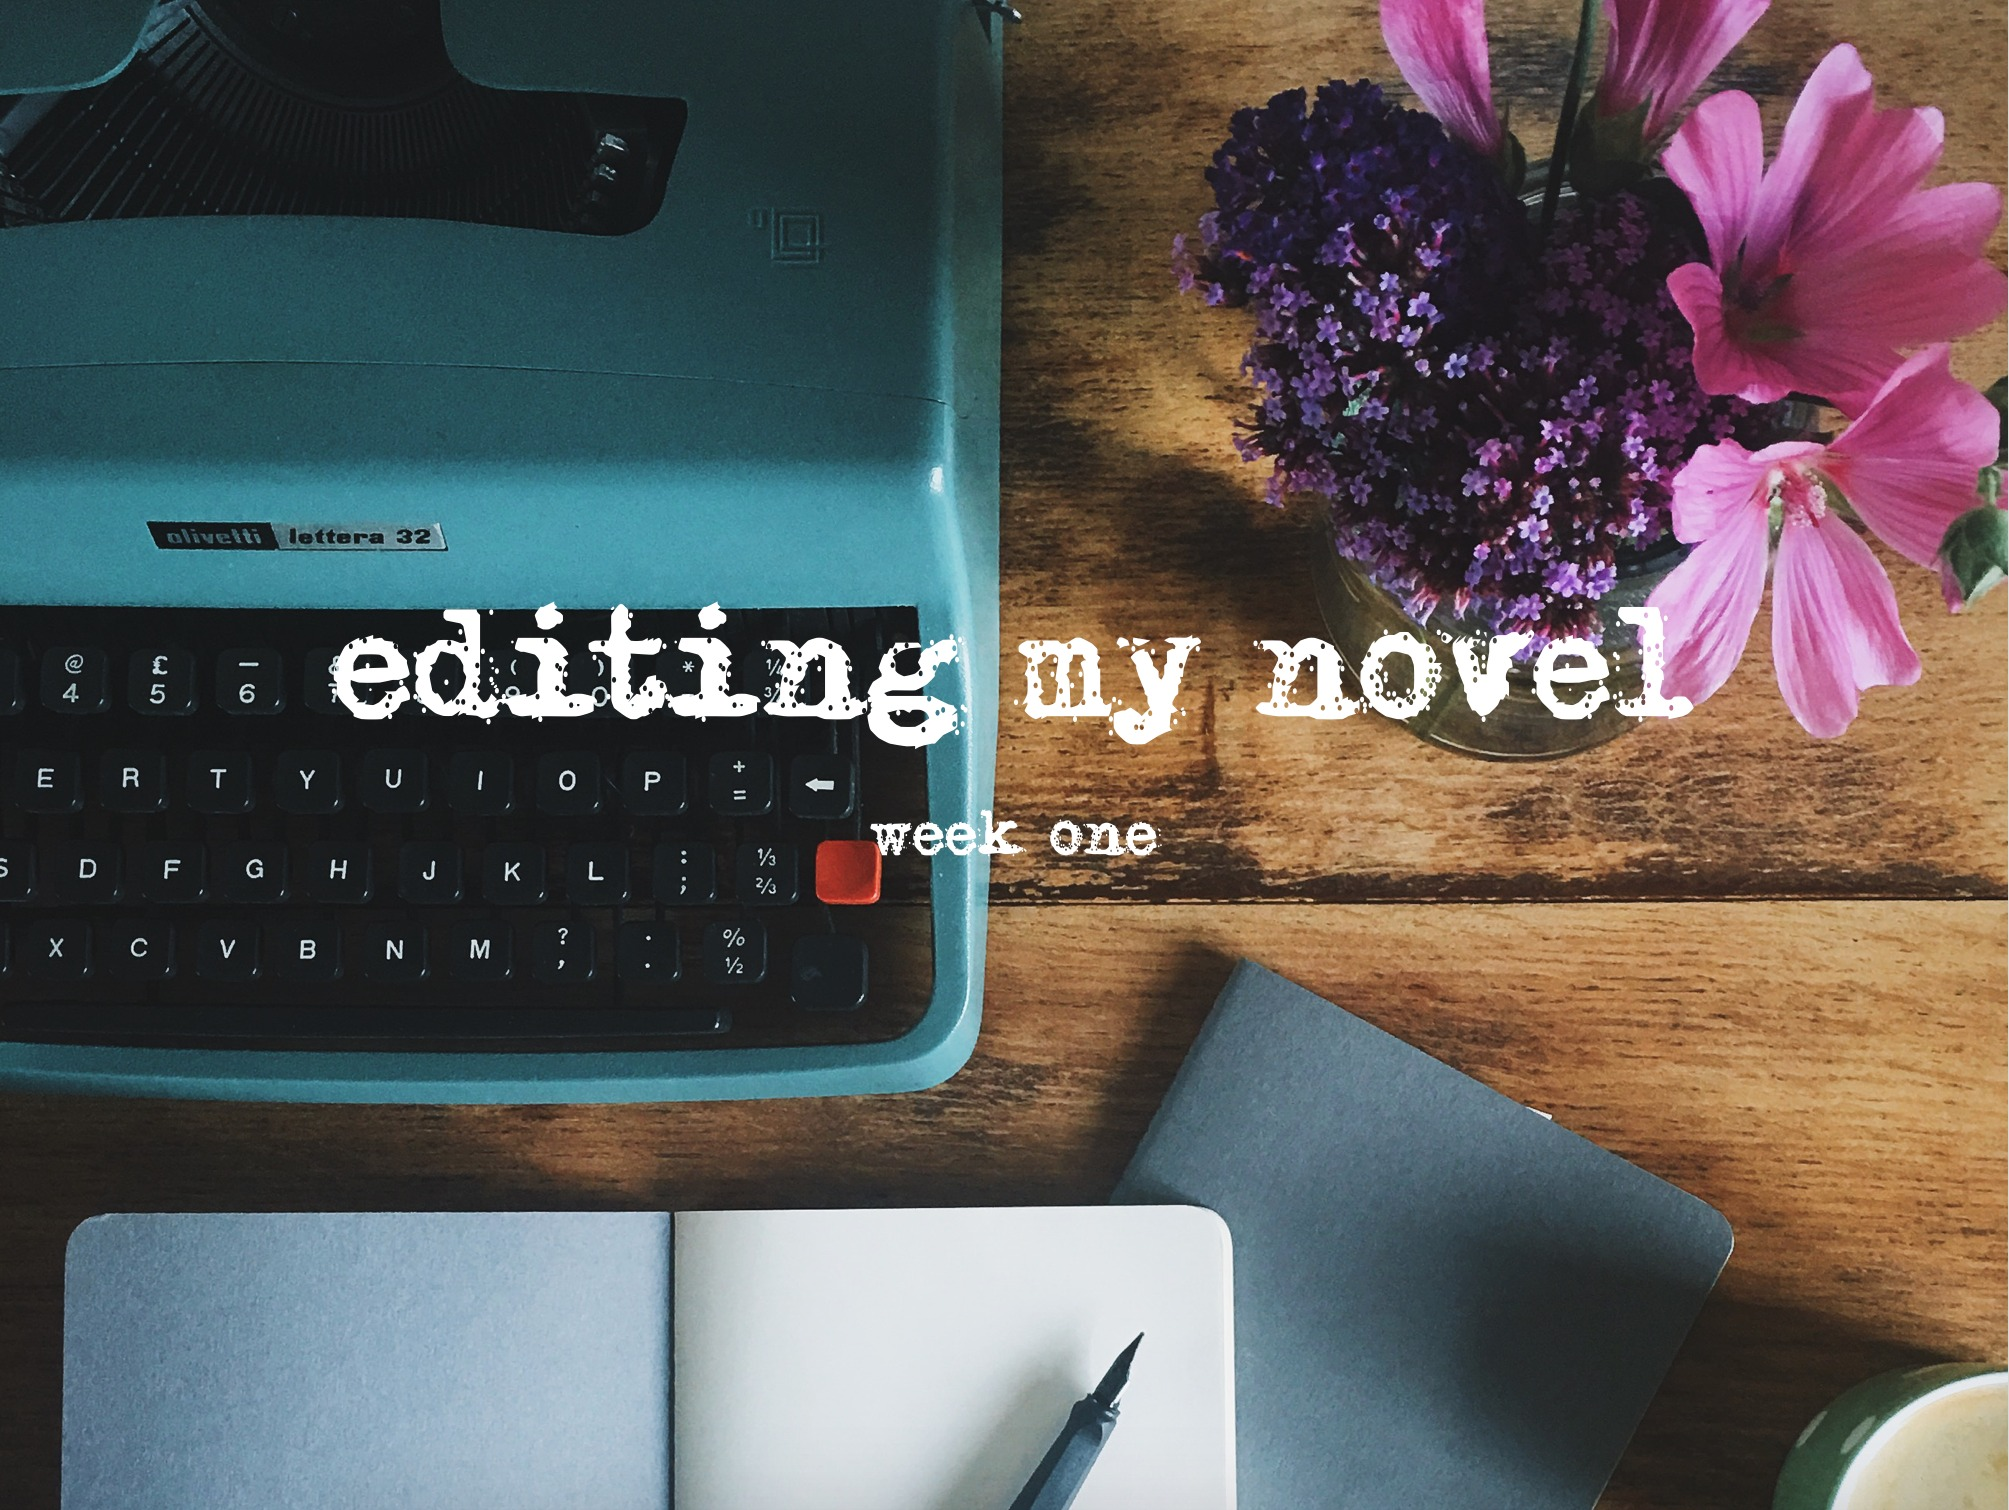 EDITING-MY-NOVEL-WEEK-ONE.jpg